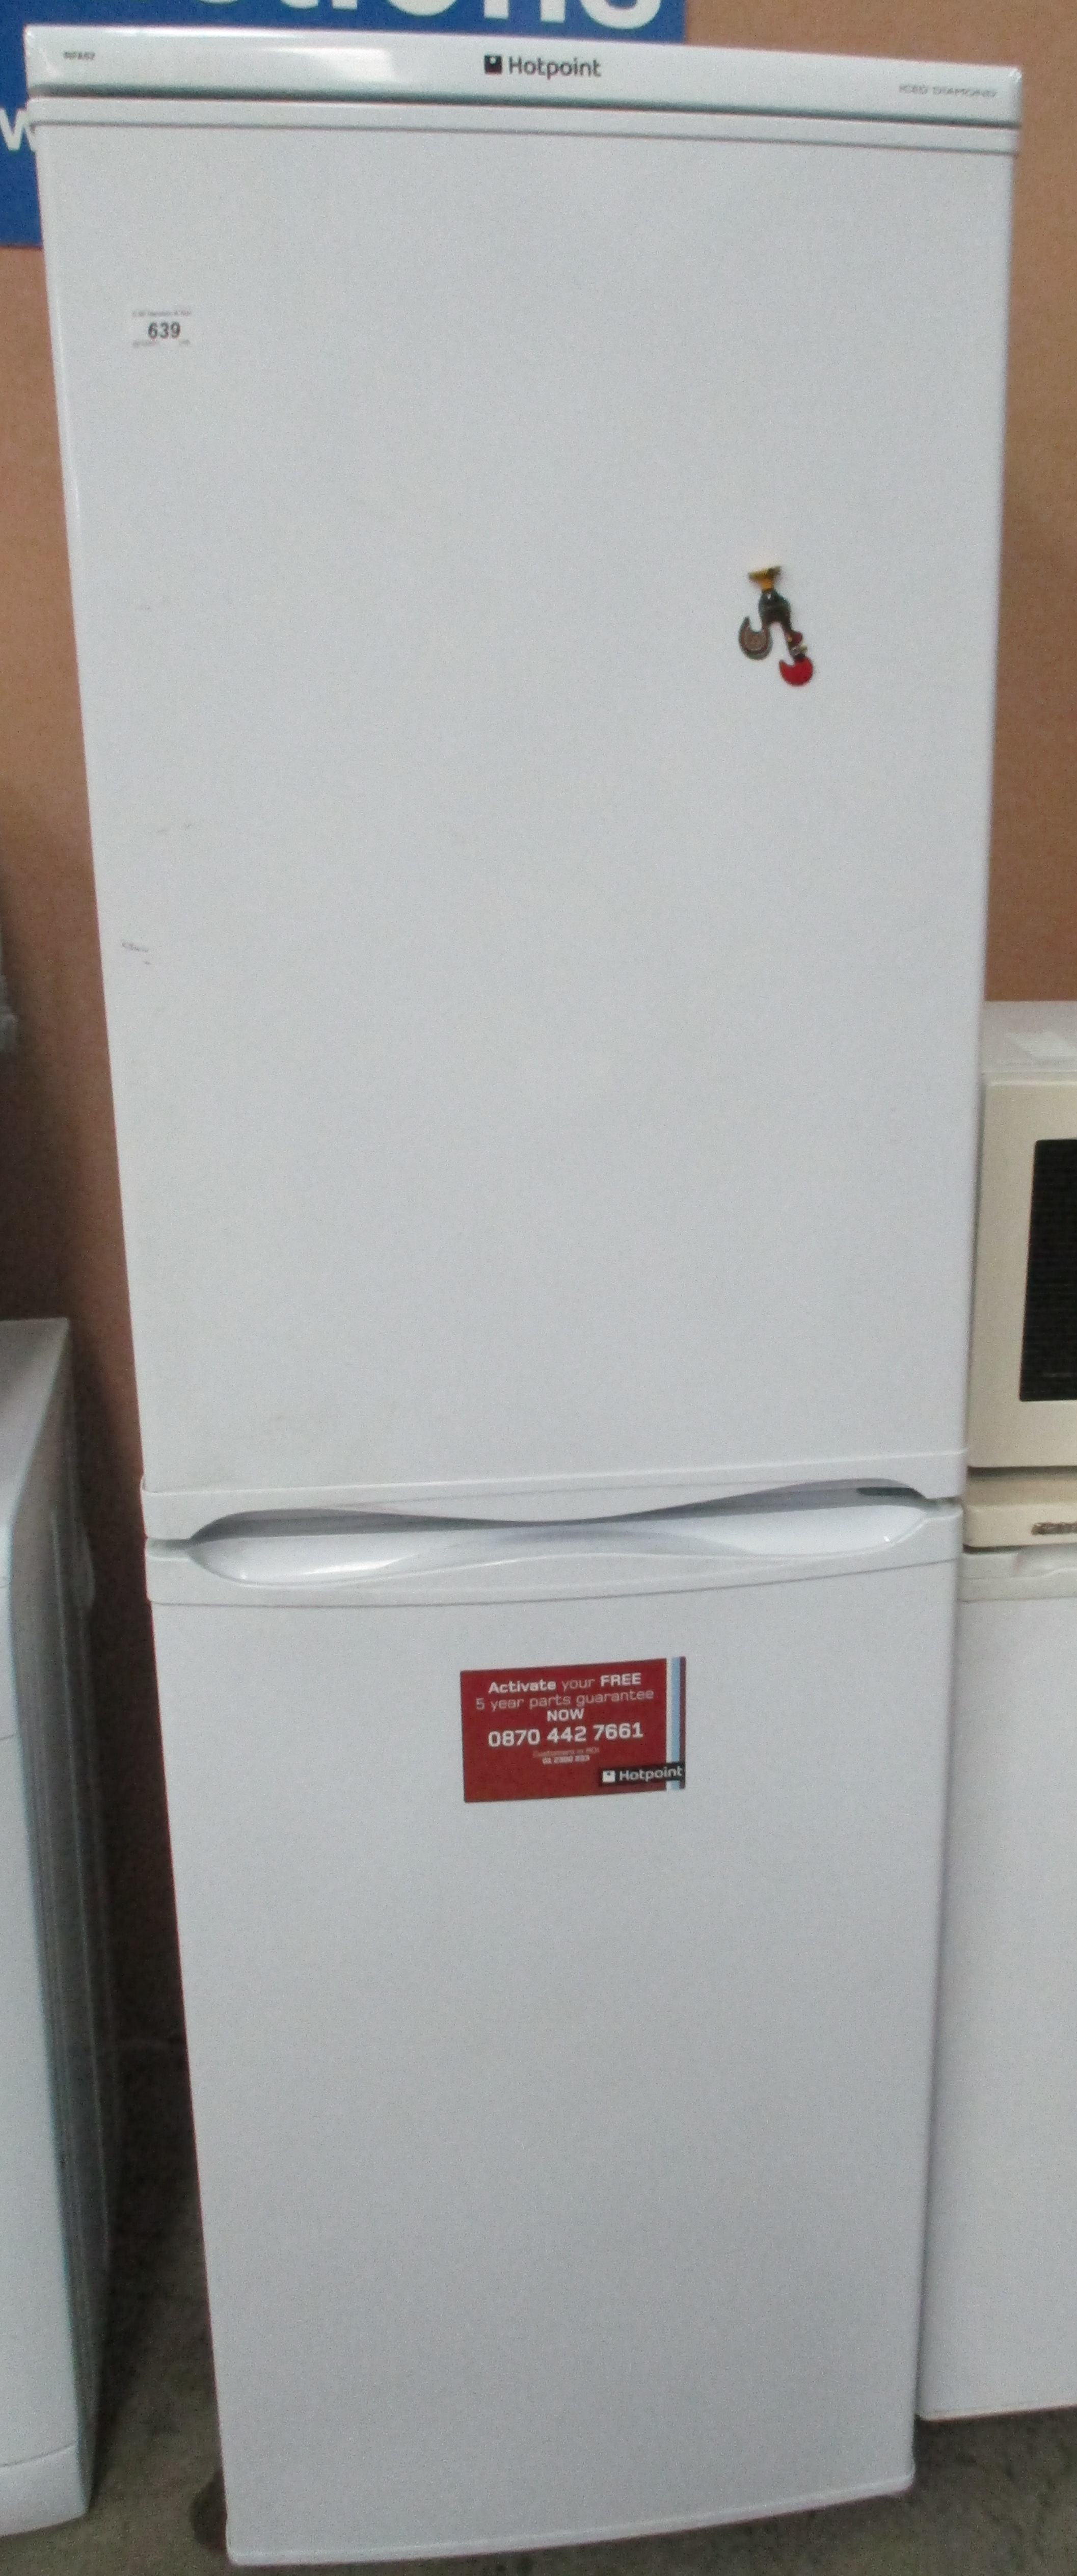 ... A Hotpoint Iced Diamond RFA52 upright fridge freezer